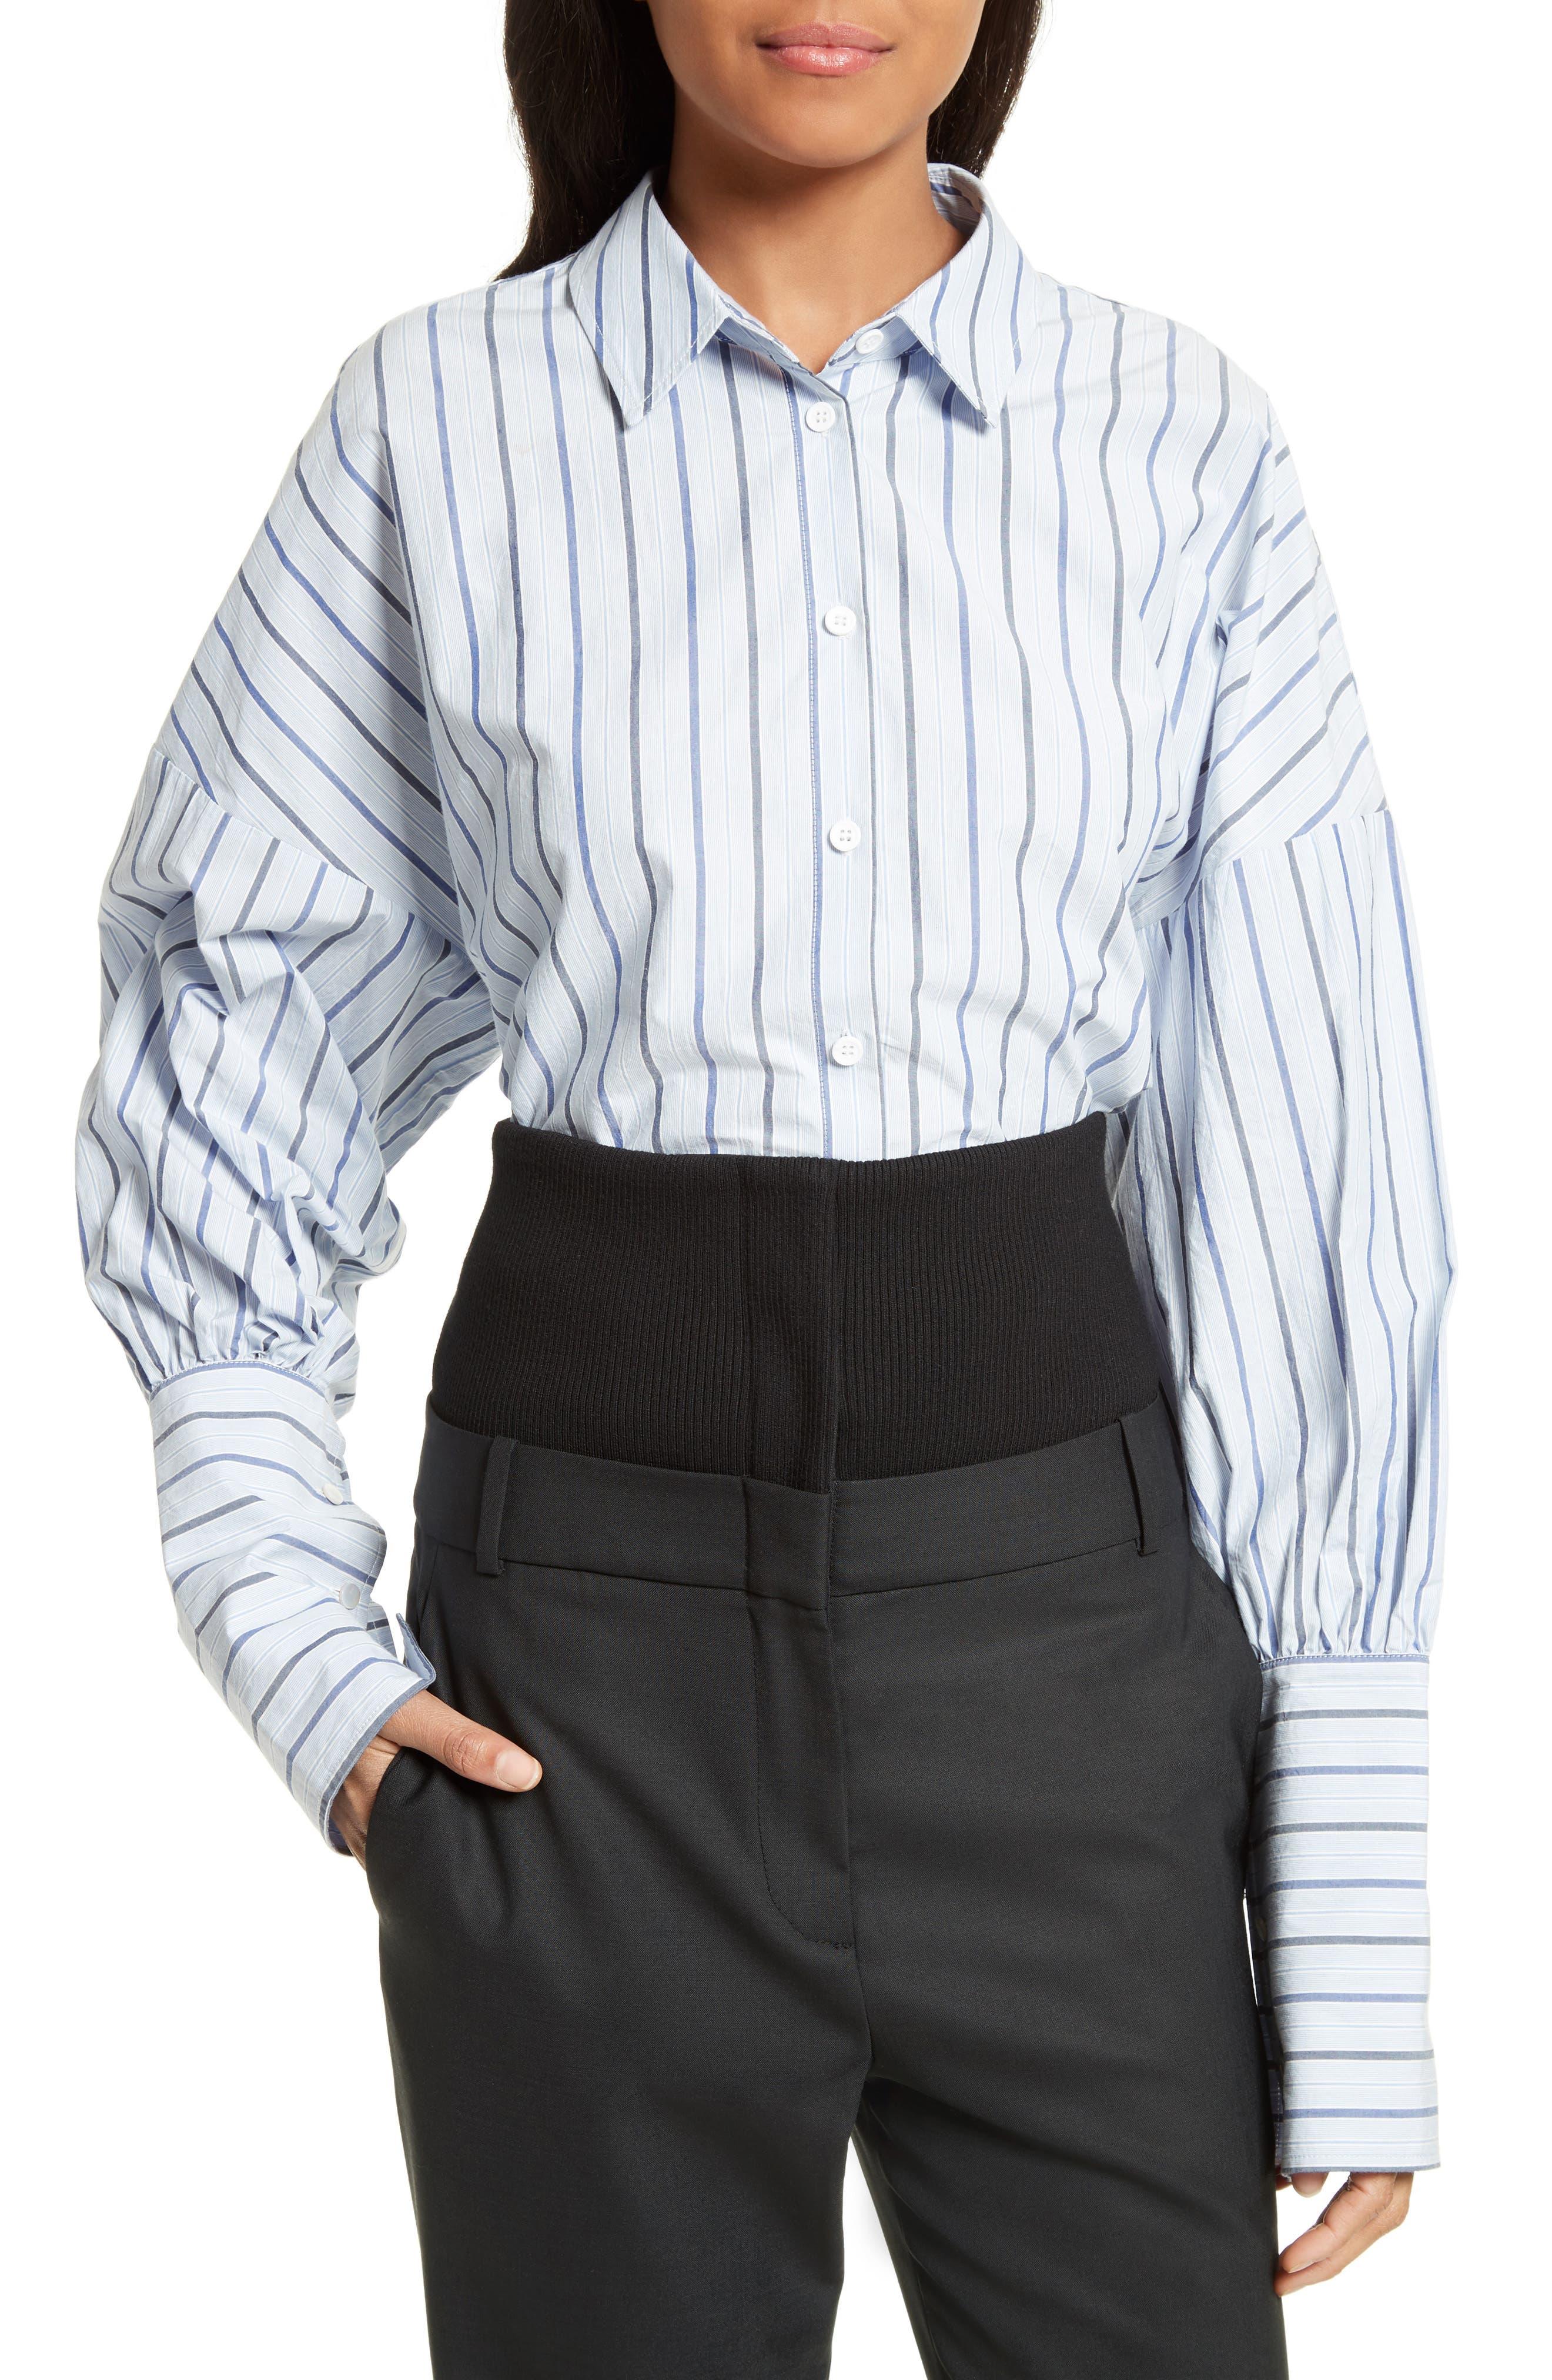 Tibi Garçon Stripe Easy Shirt